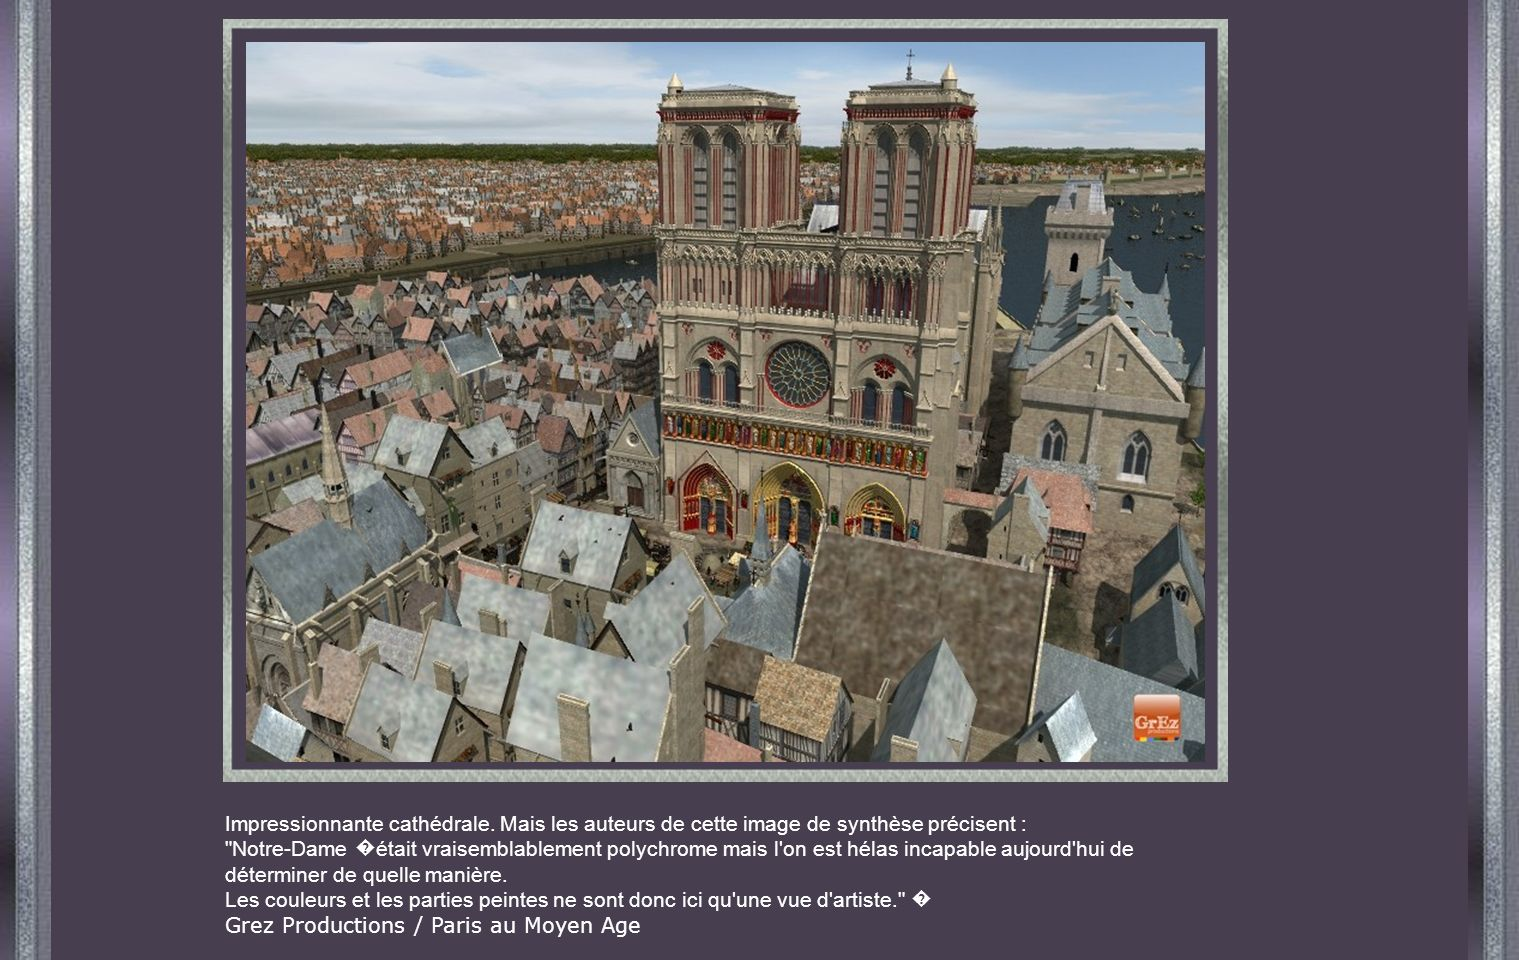 Impressionnante cathédrale